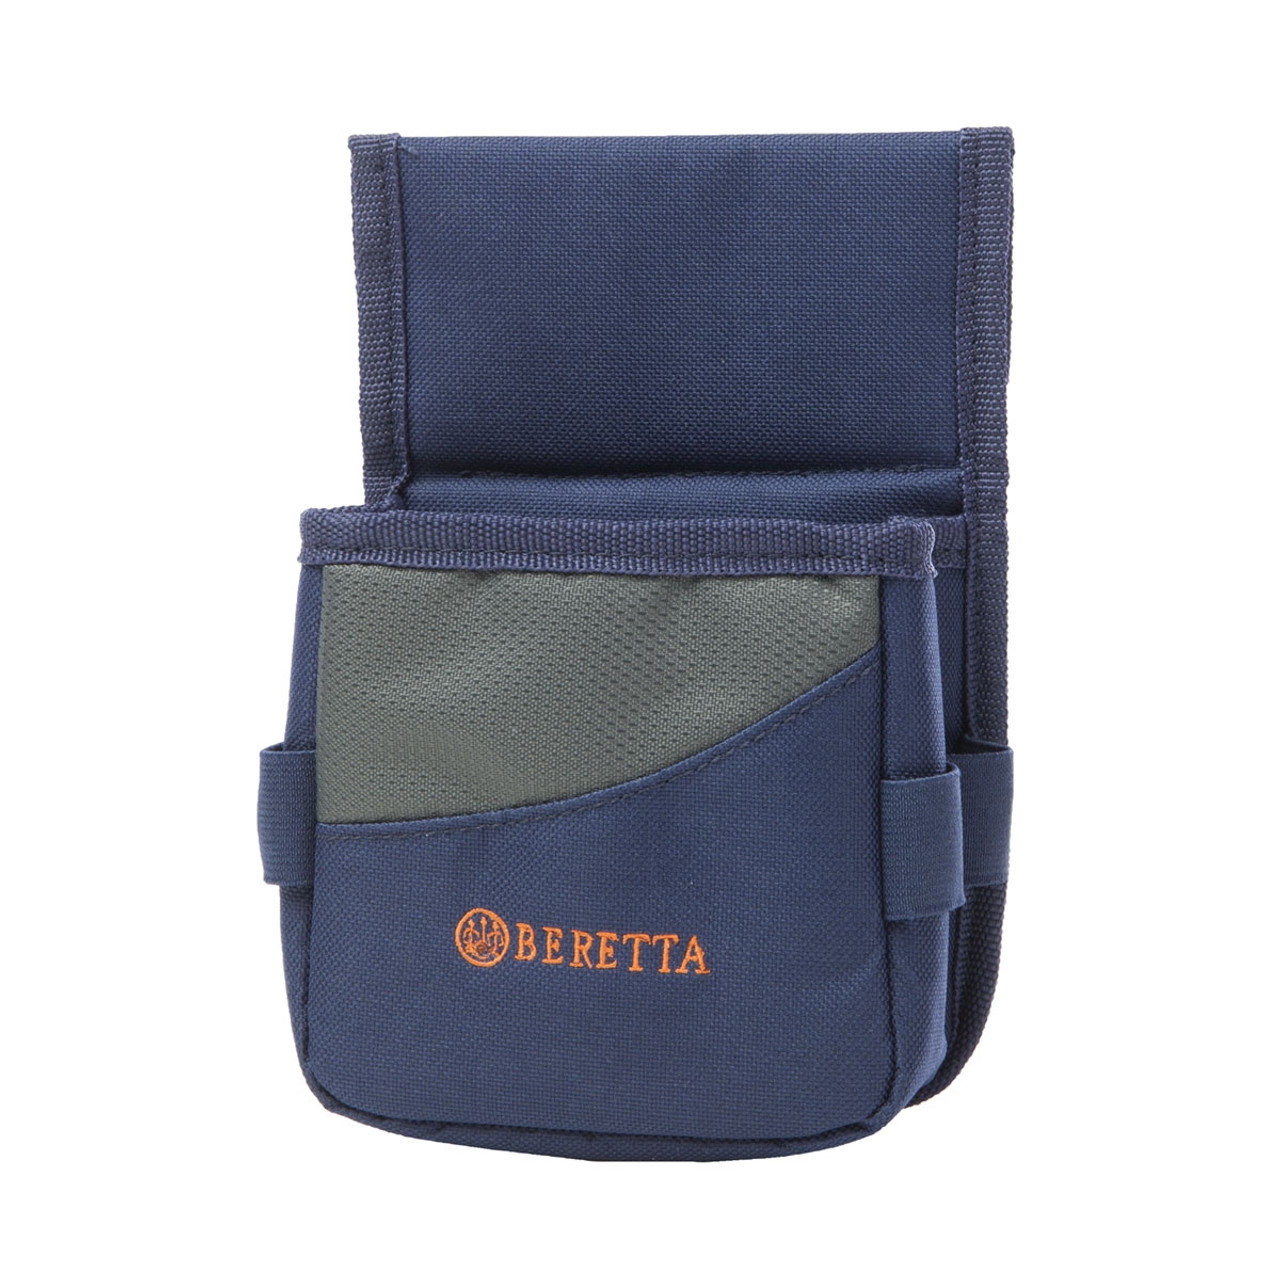 Beretta Uniform Pro Cartridge Pouch